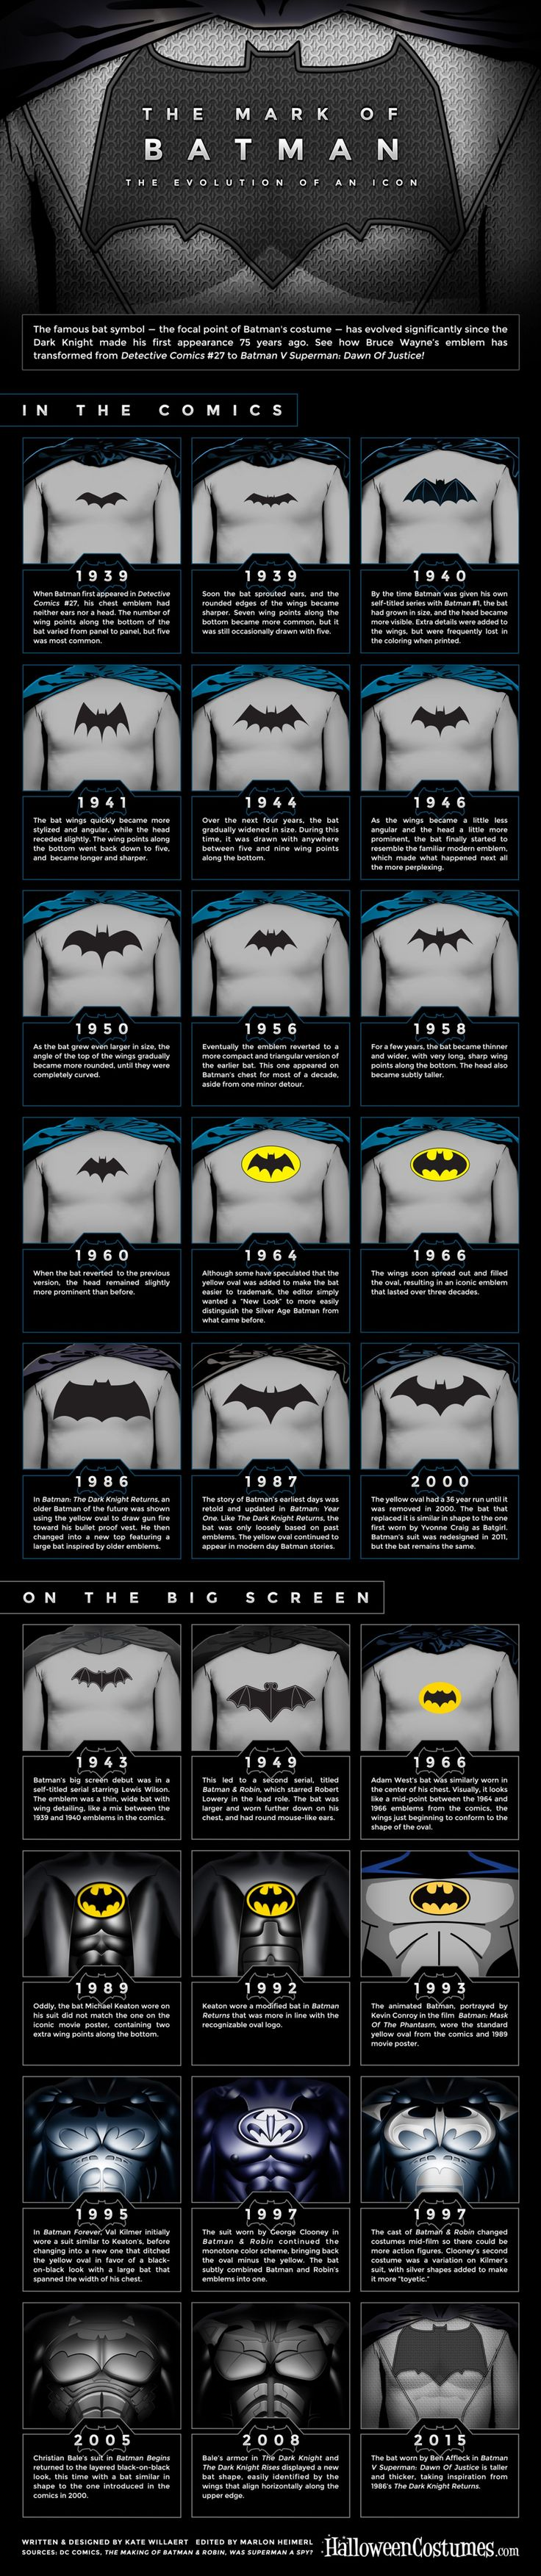 the mark of batman